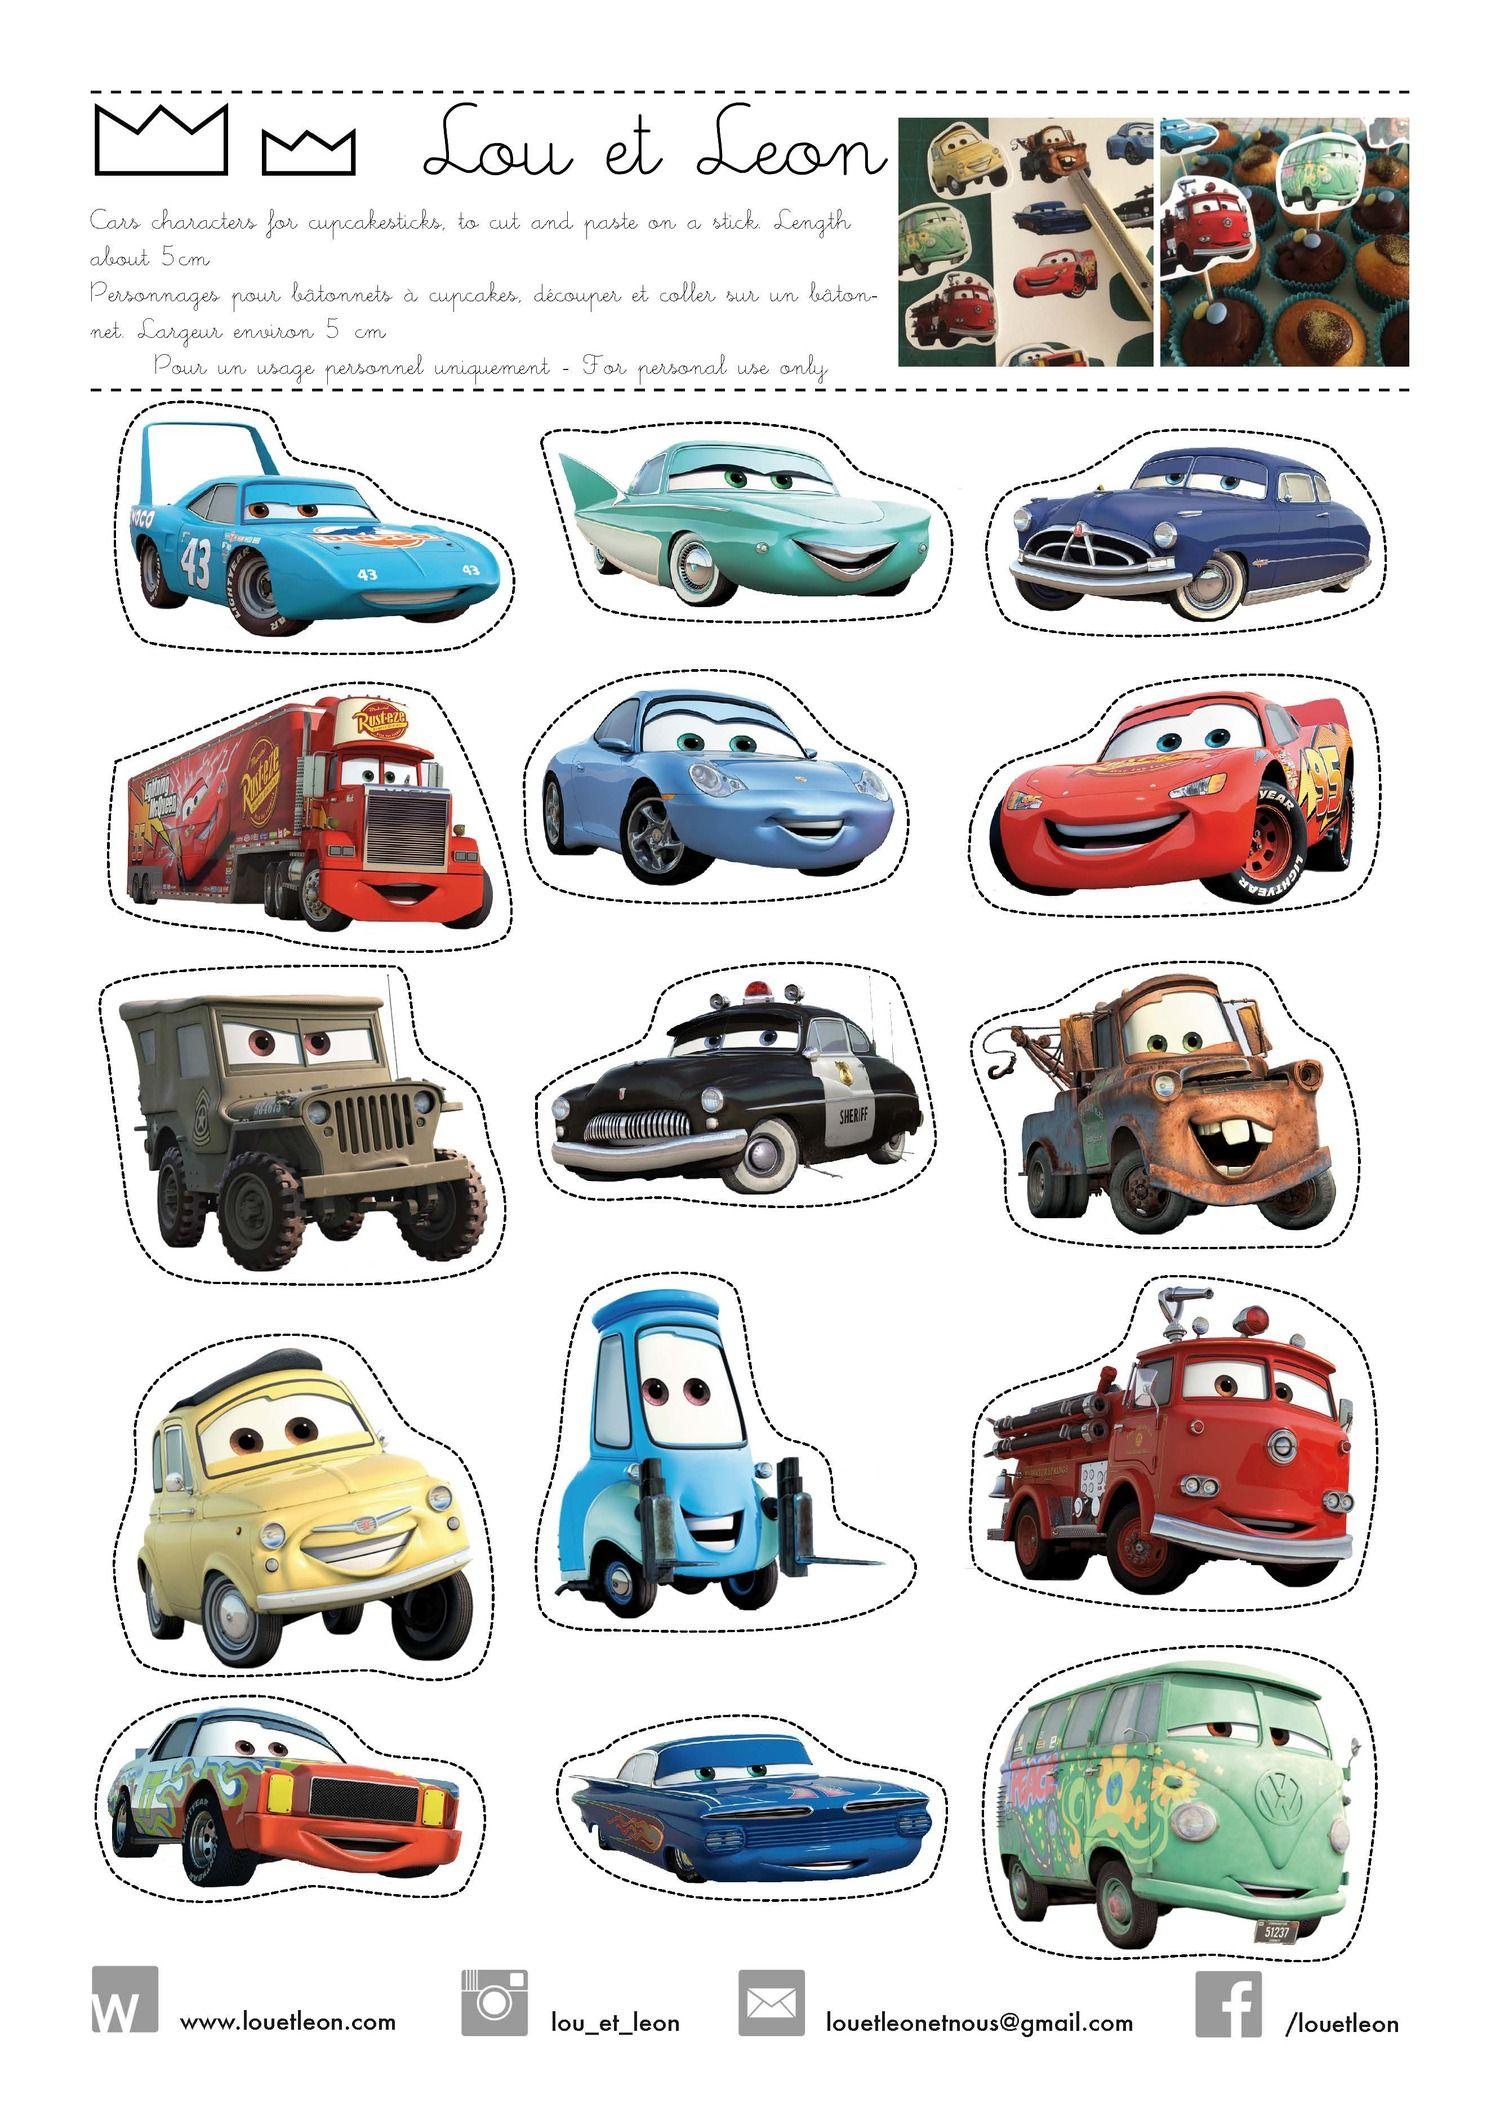 Car Cake Image Free Download : Free download cars cupcakes sticks! Cars, lighting McQueen ...